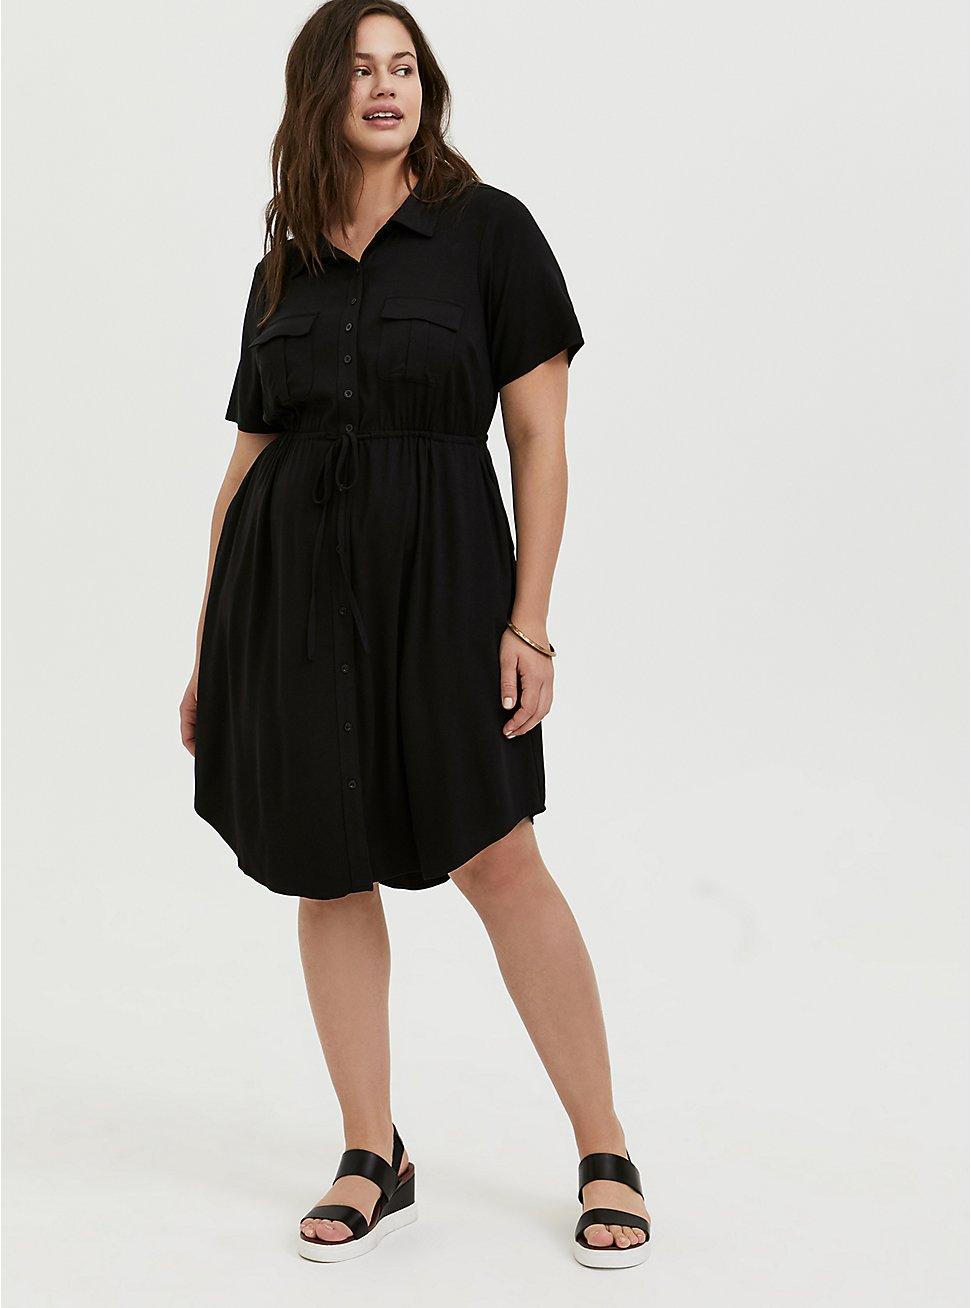 Black Twill Button Front Drawstring Shirt Dress, DEEP BLACK, hi-res